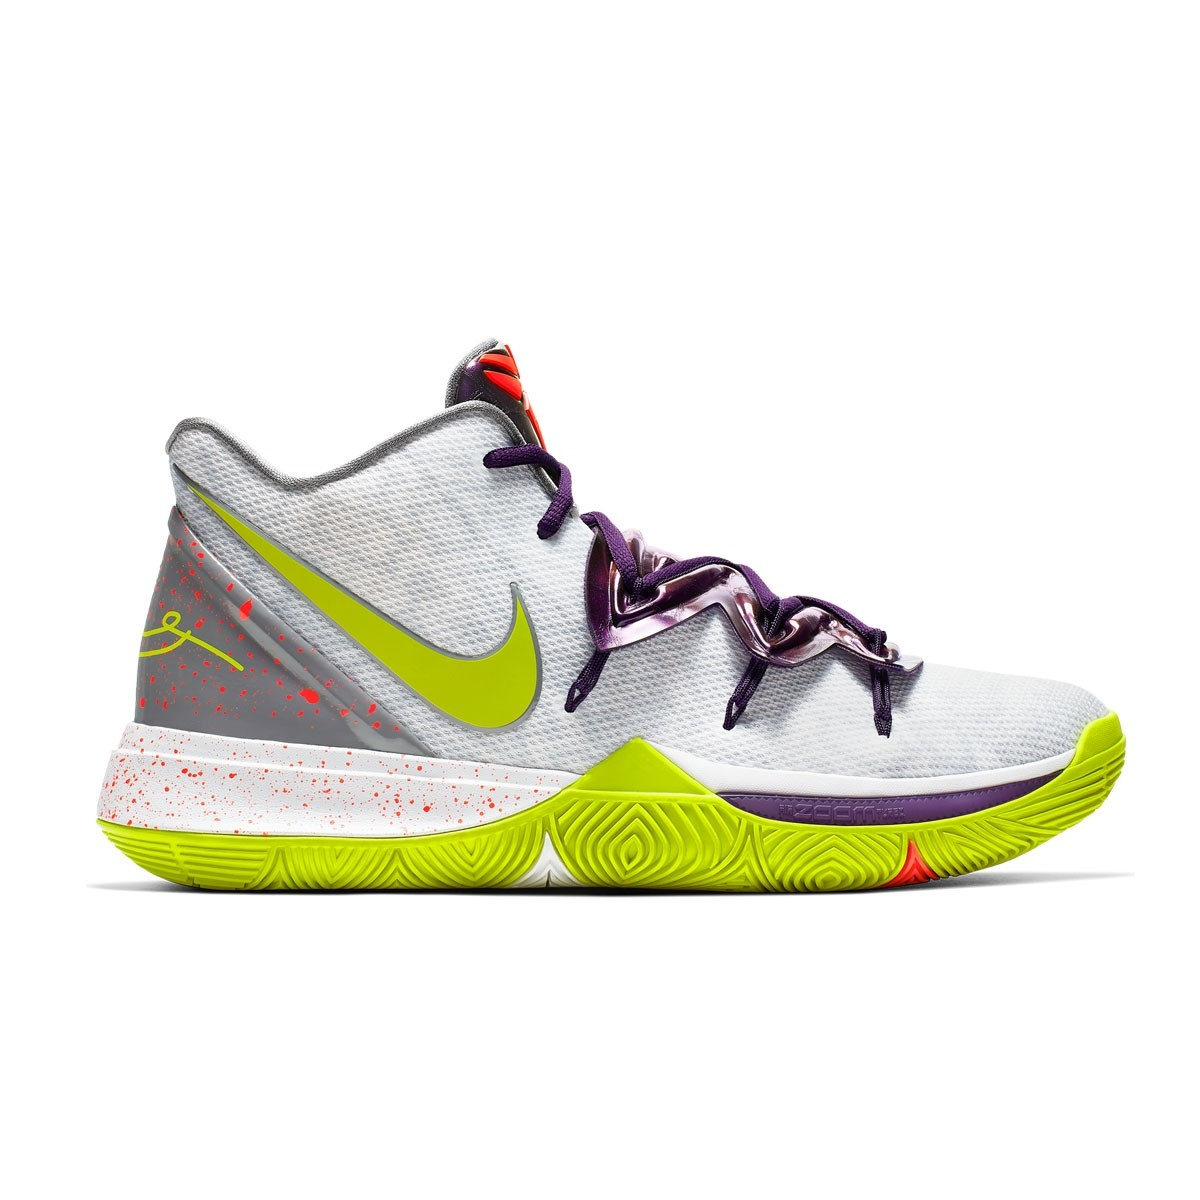 53ec0acd7fe Buy Nike Kyrie 5  Mamba Mentality  Basketball shoes   sneakers